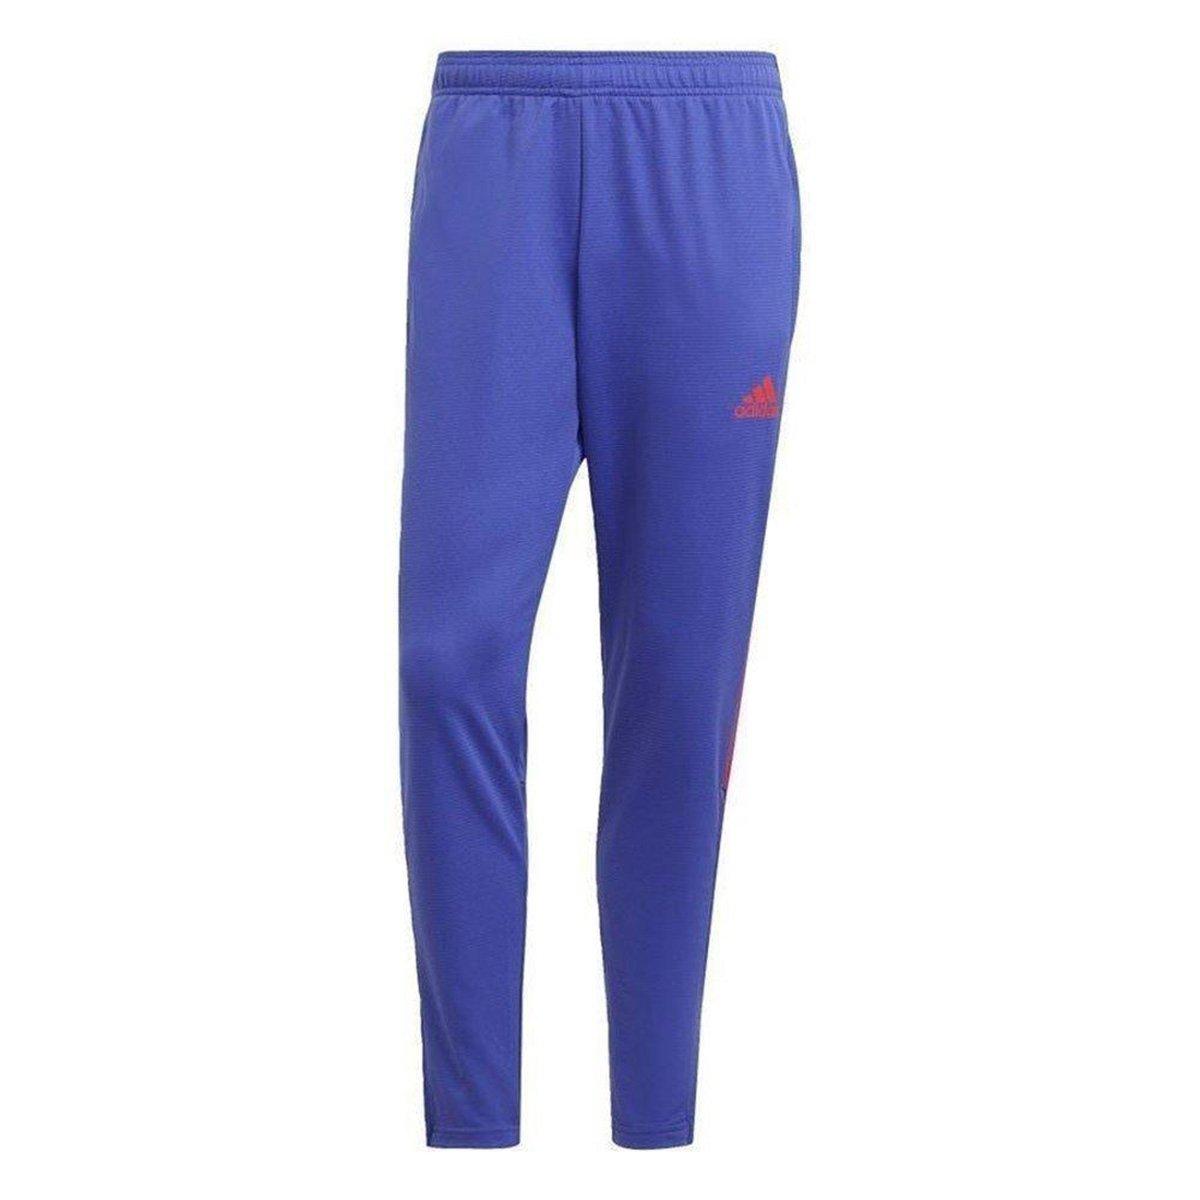 Calça Adidas Tiro Primeblue Slim Masculina